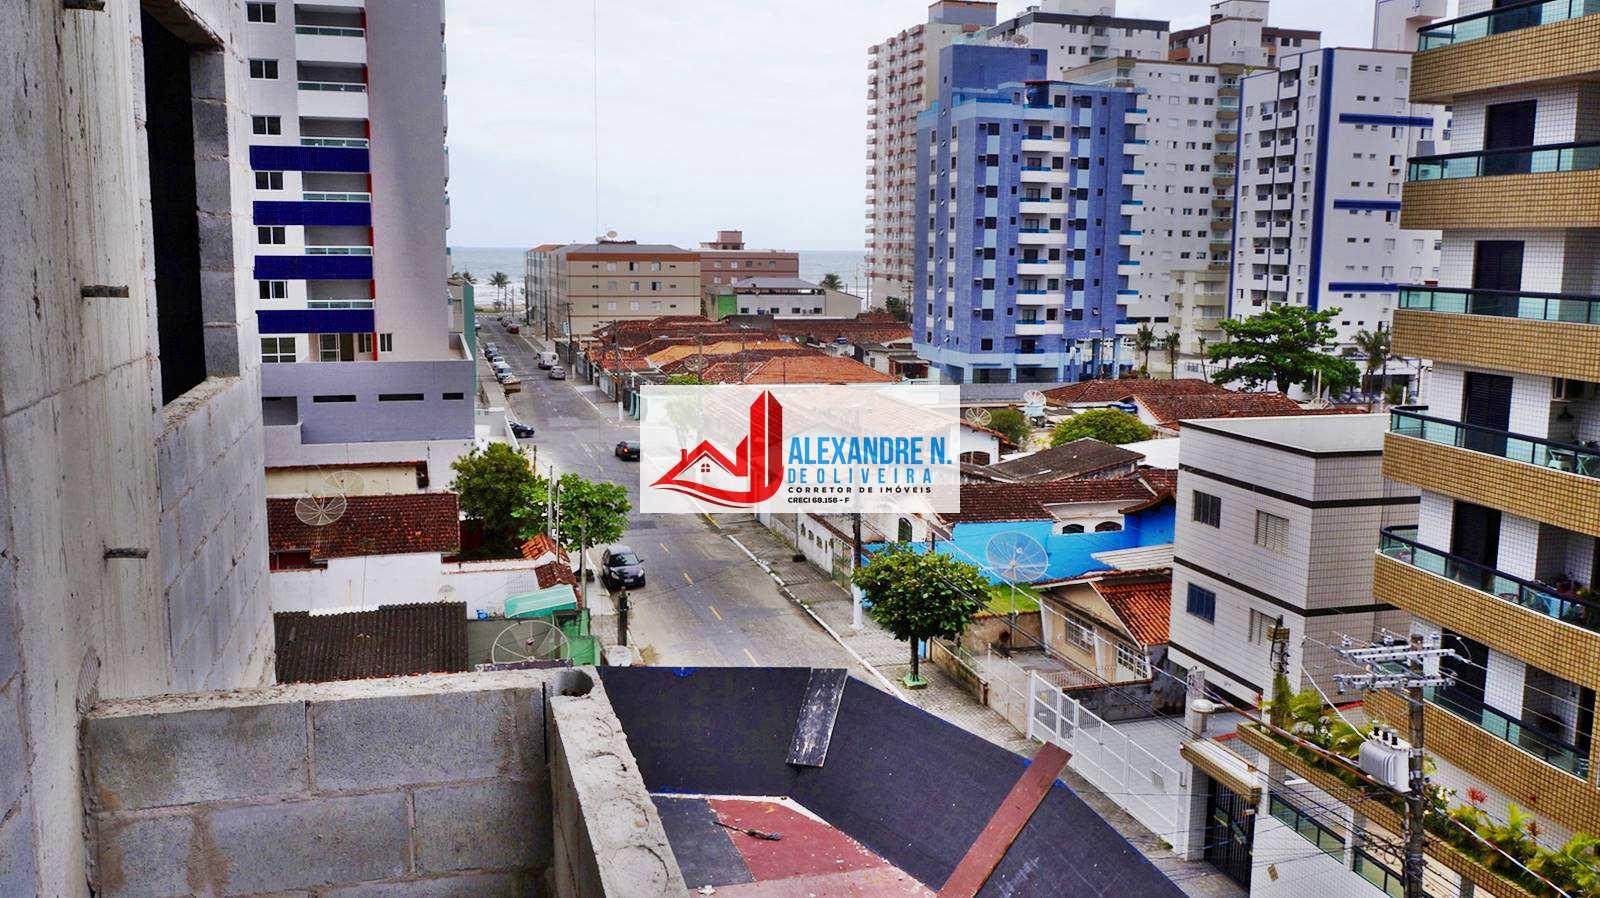 Apto 2 dorms, Ocian, Praia Grande, Entr. R$ 40 mil, AP00636.